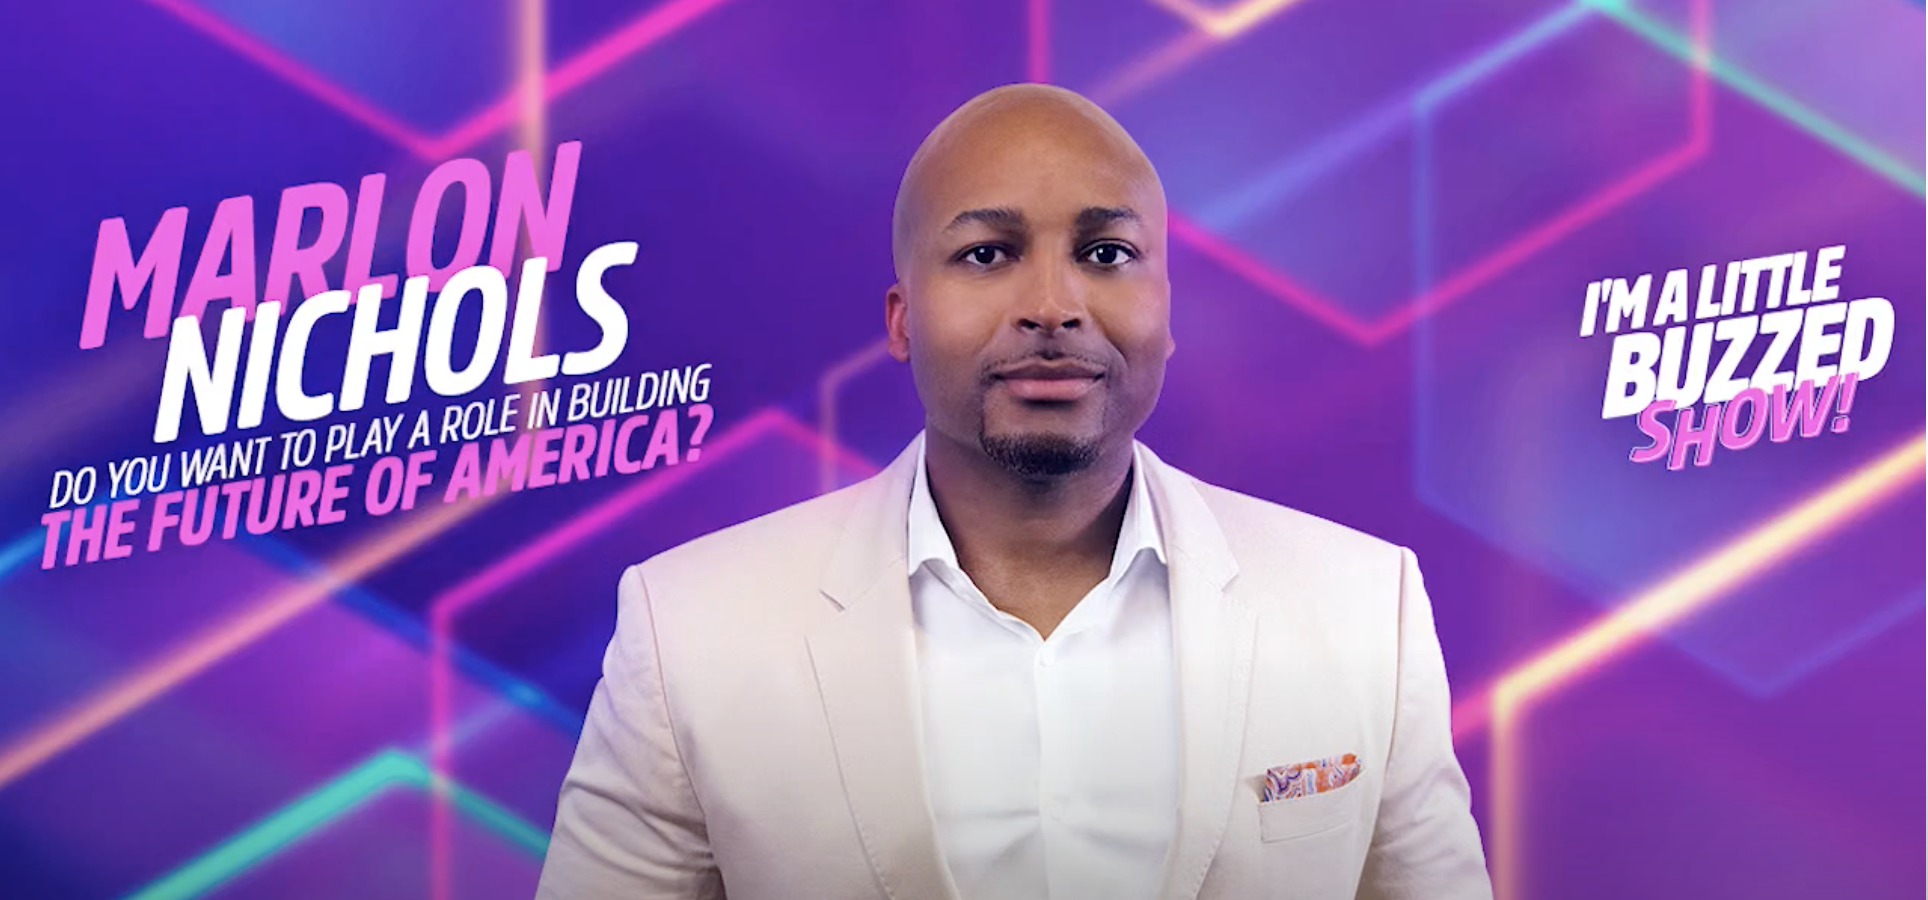 Marlon Nichols x No Bull Business' #ImaLittleBuzzed on Diversity and Inclusion